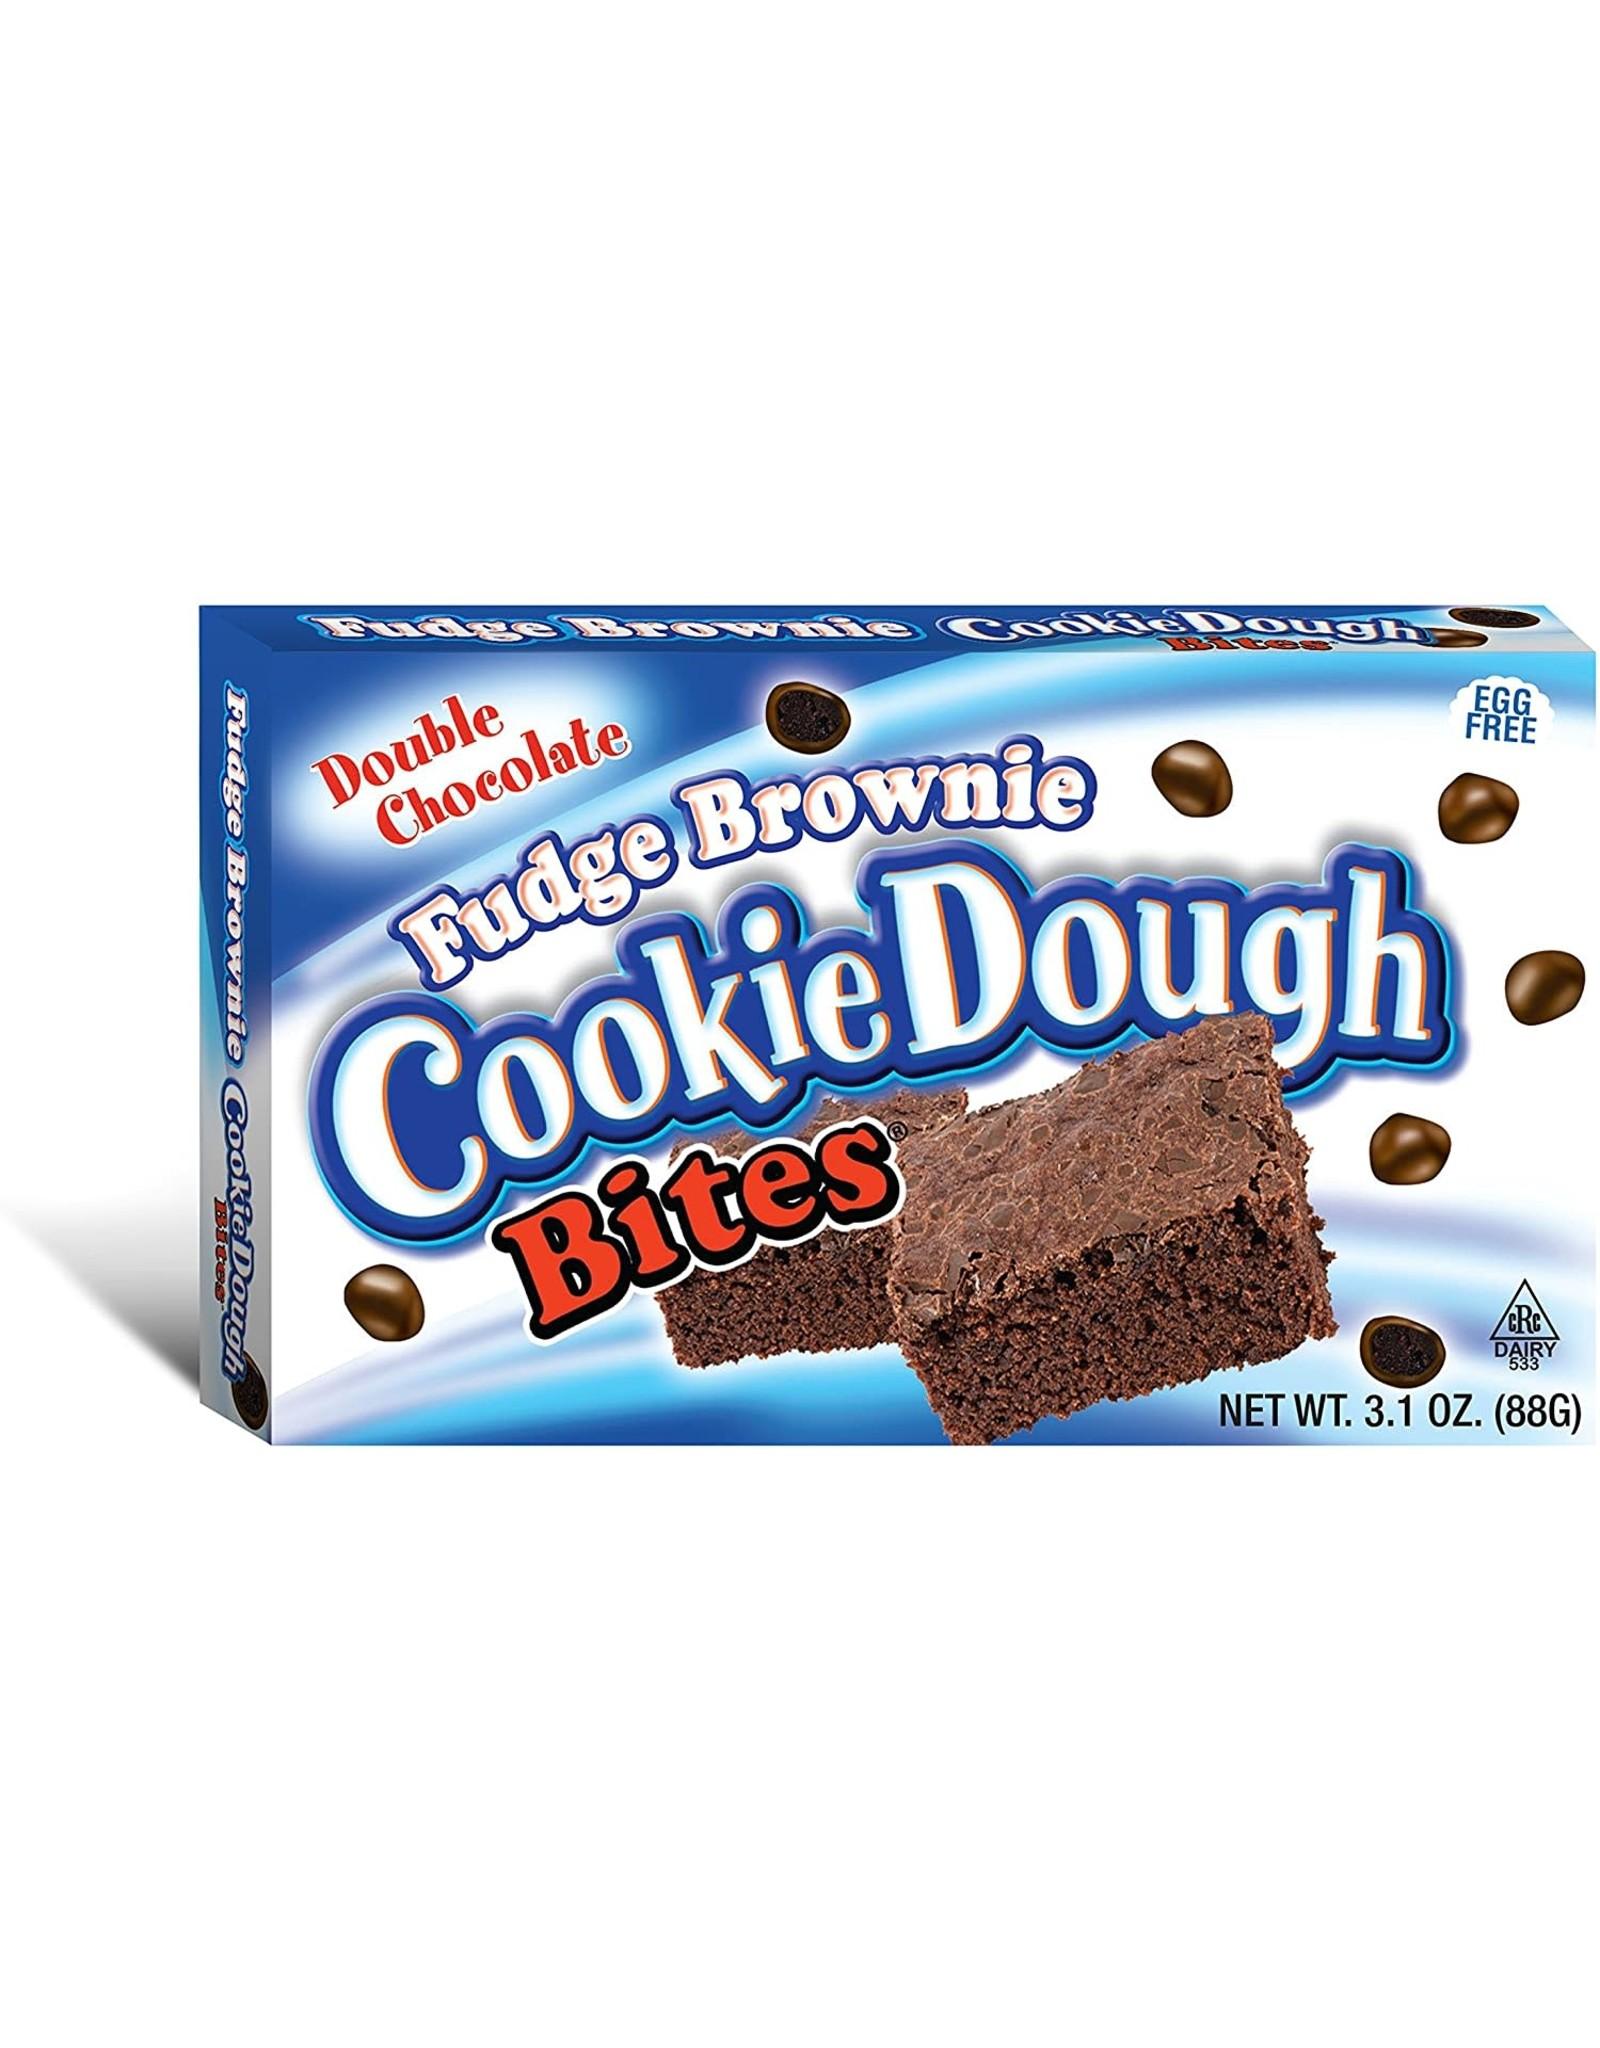 CookieDough Bites: Fudge Brownie - 88g